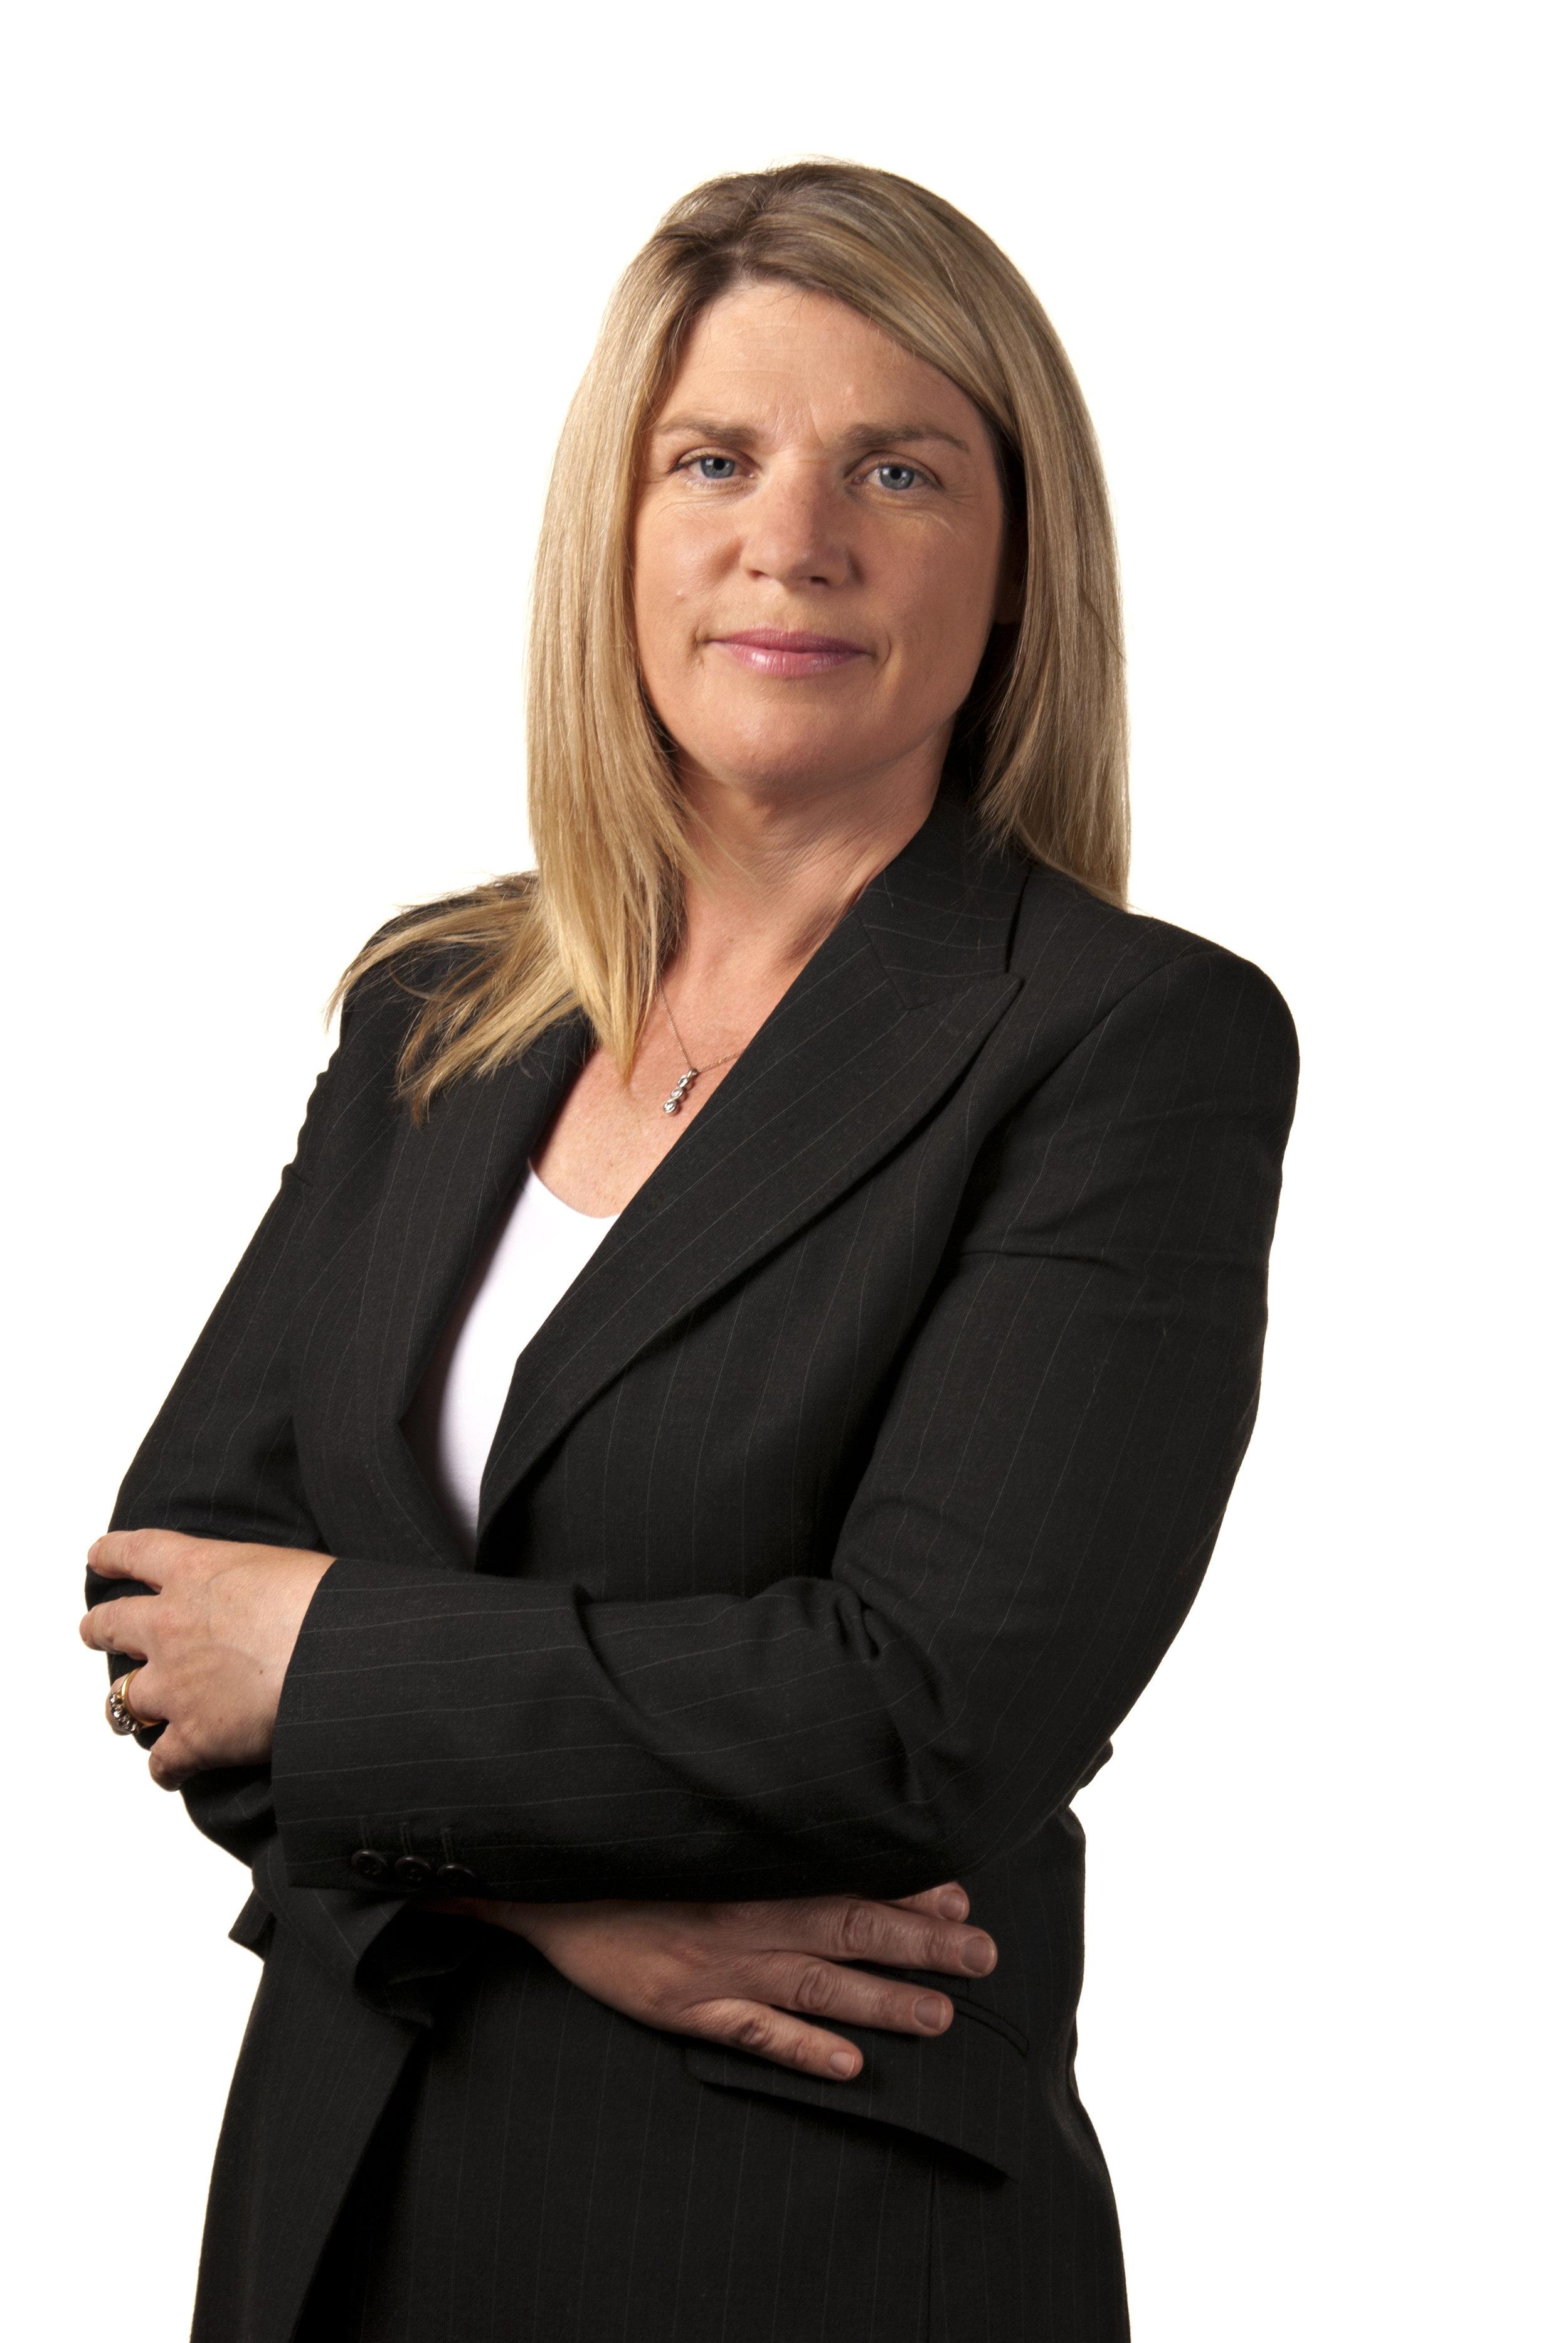 Sharon Fitzpatrick